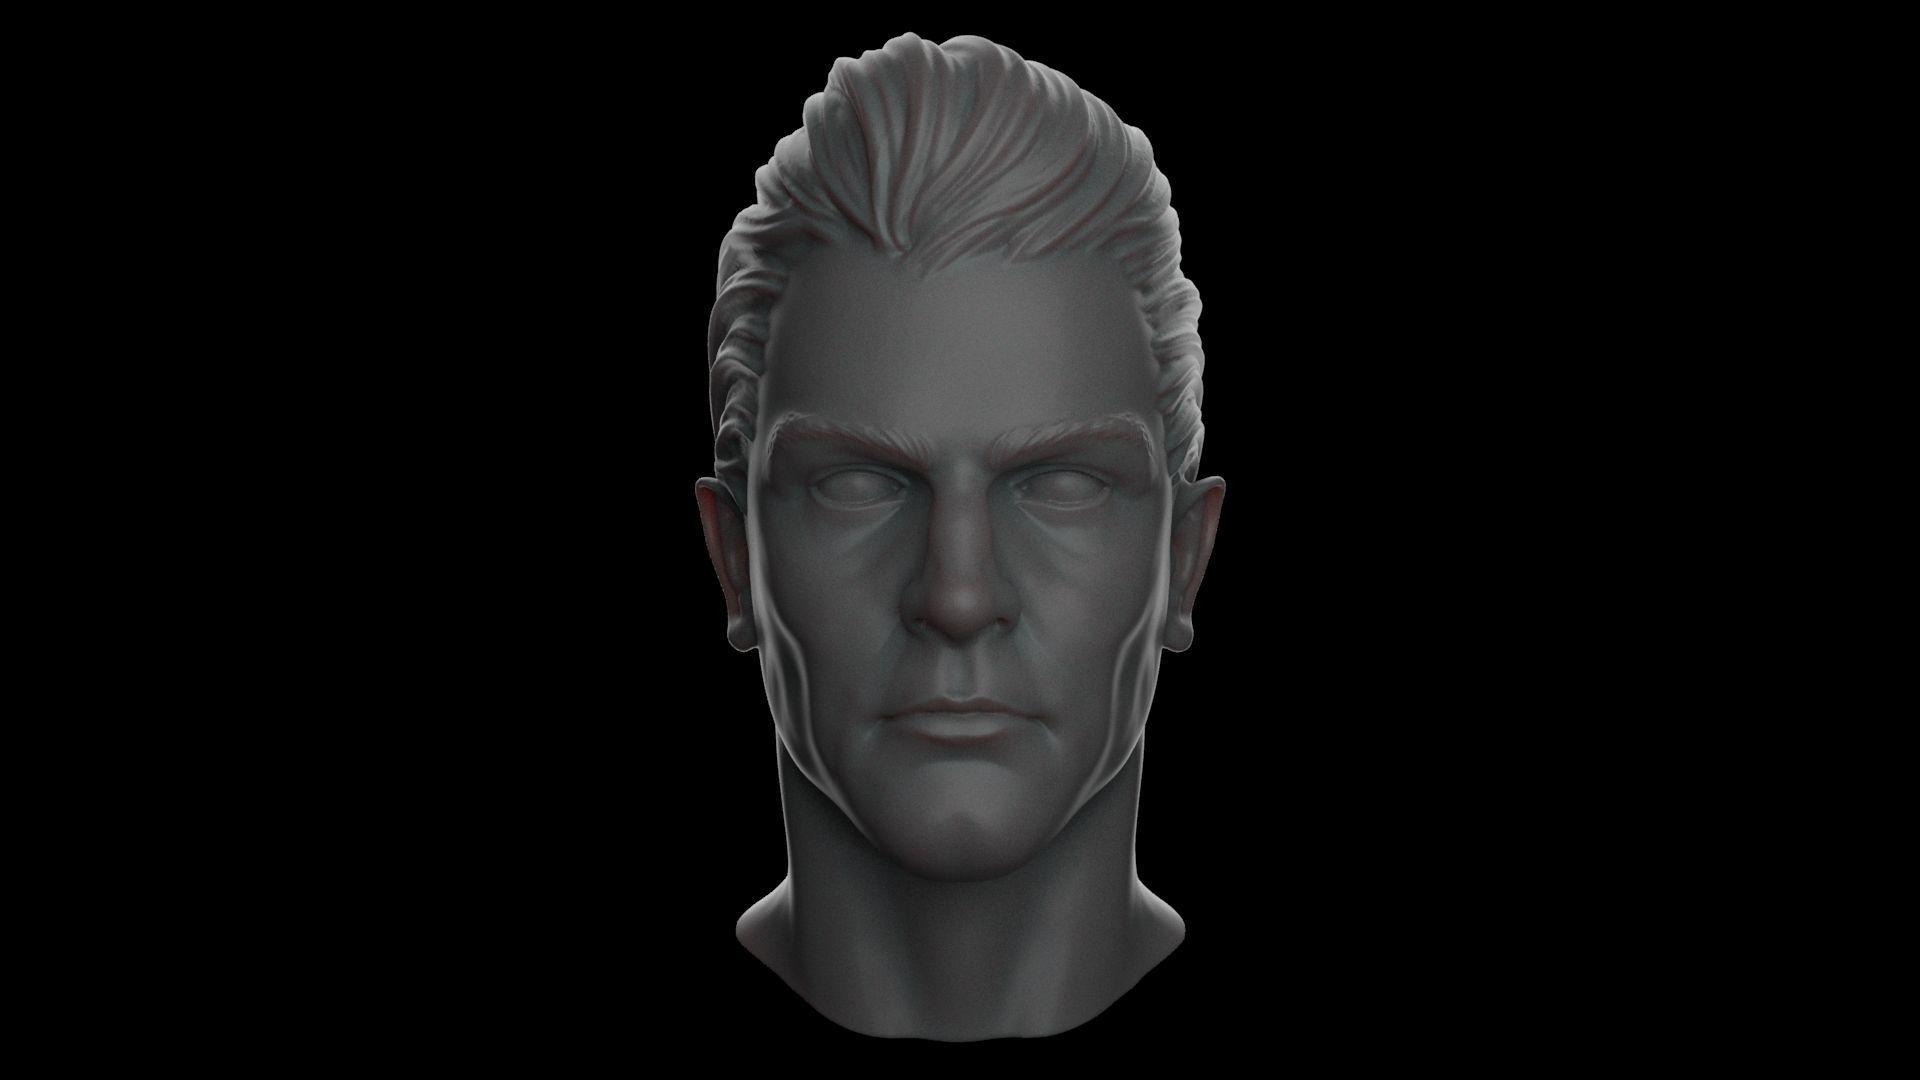 Realistic Human Male Head - Basic Human